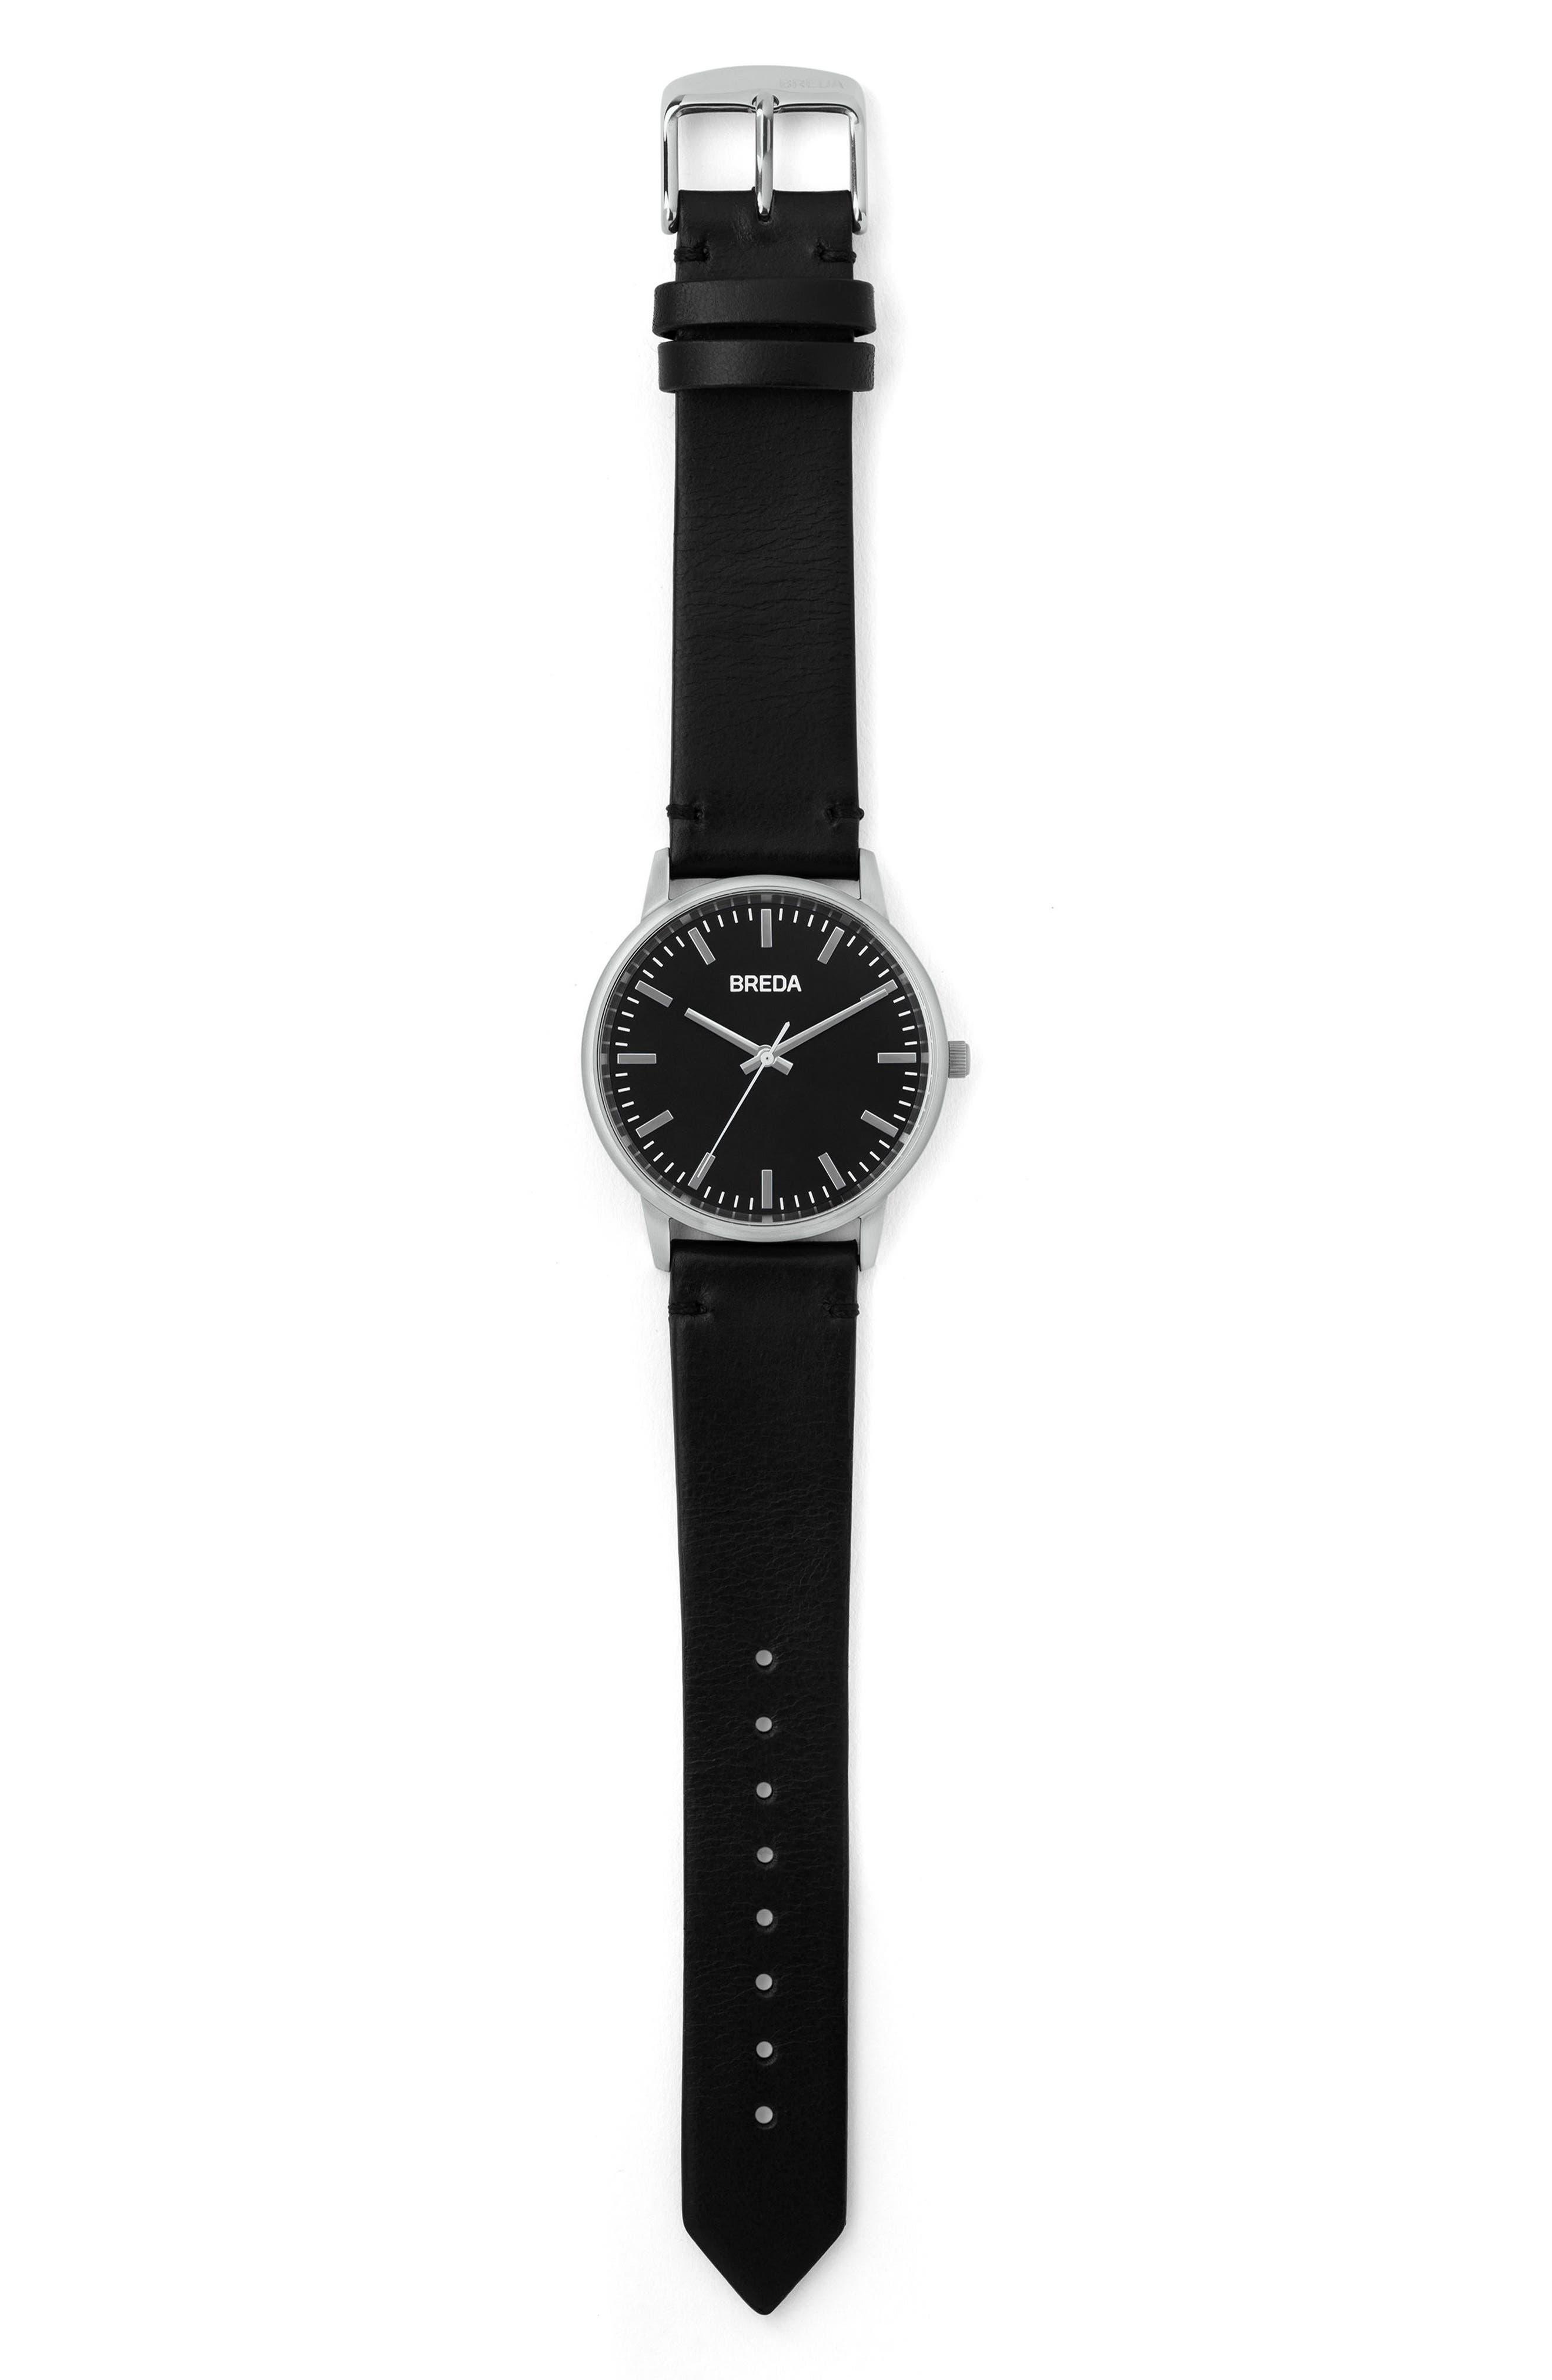 BREDA, Zapf Leather Strap Watch, 39mm, Alternate thumbnail 3, color, 001